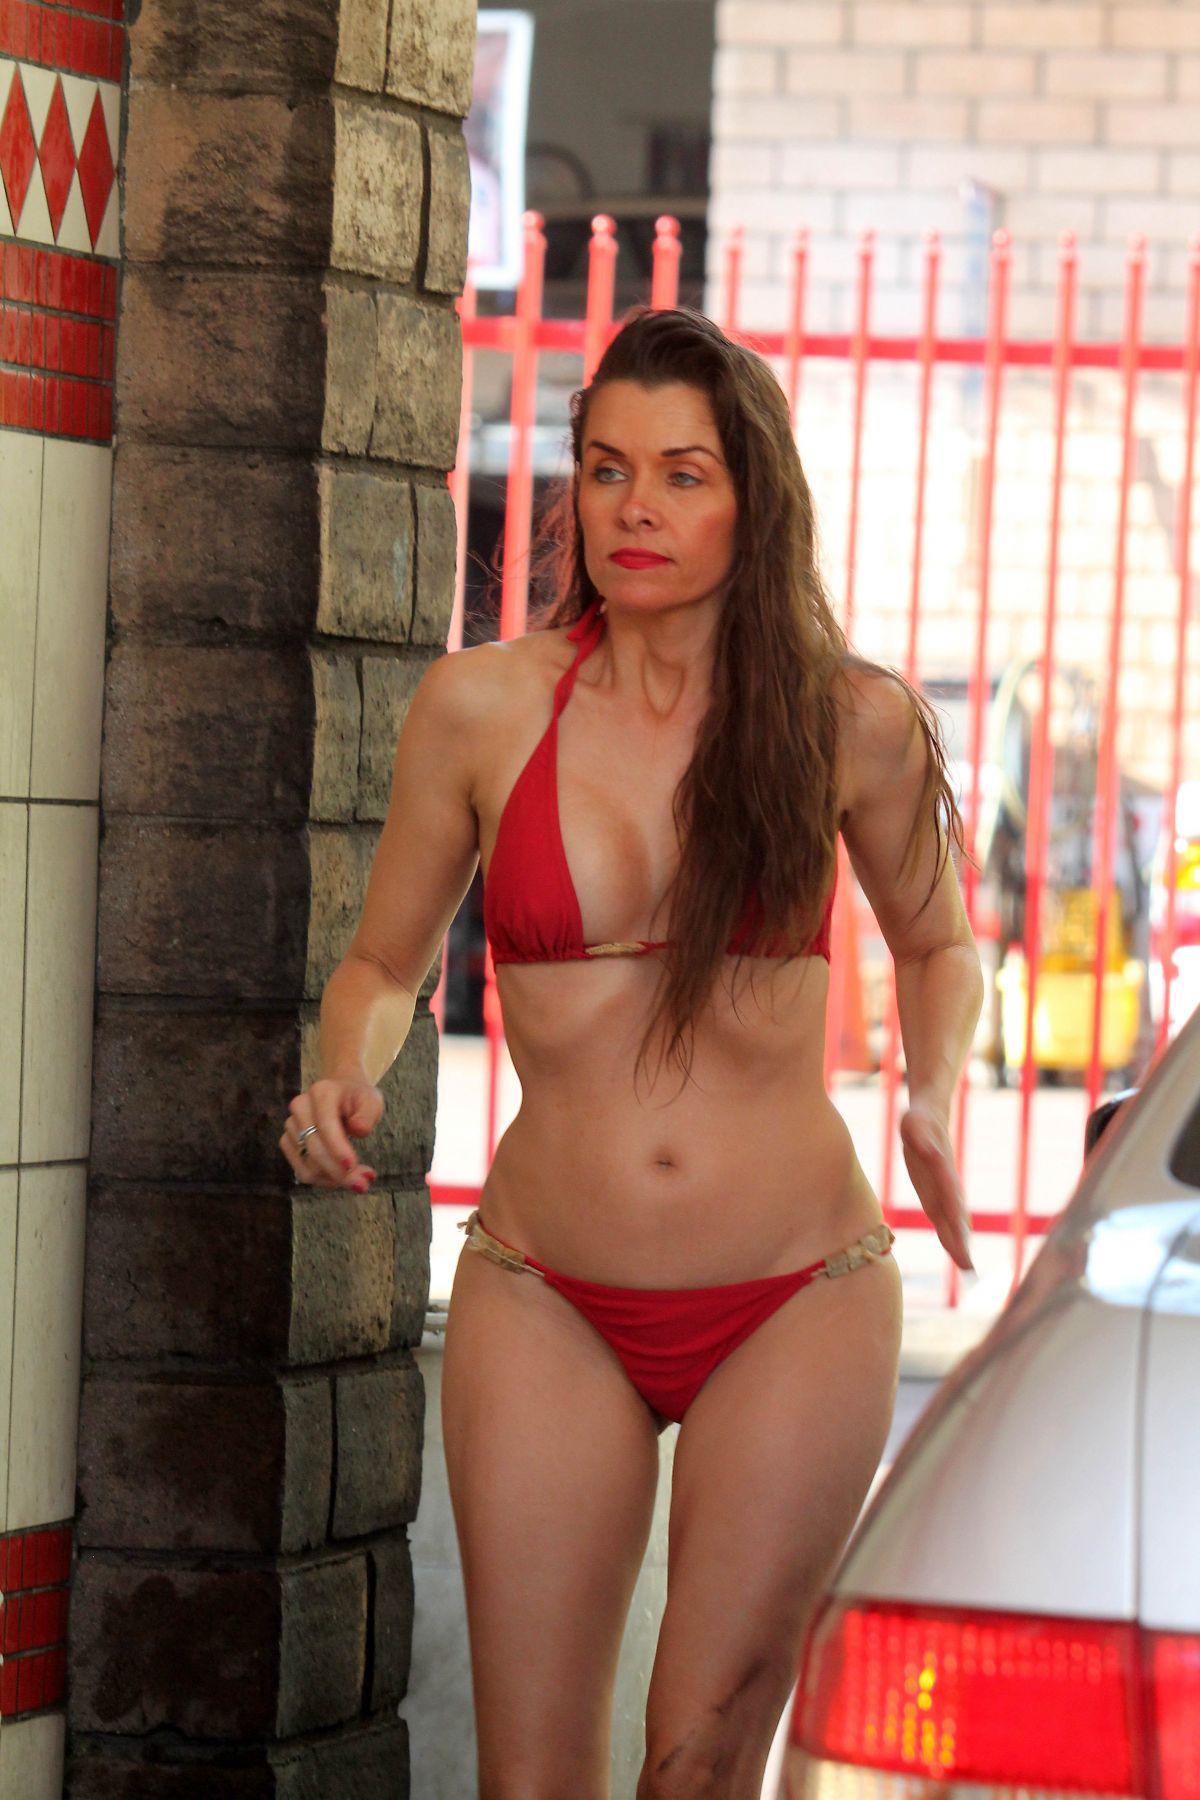 Alicia Arden in a bikini on a city street